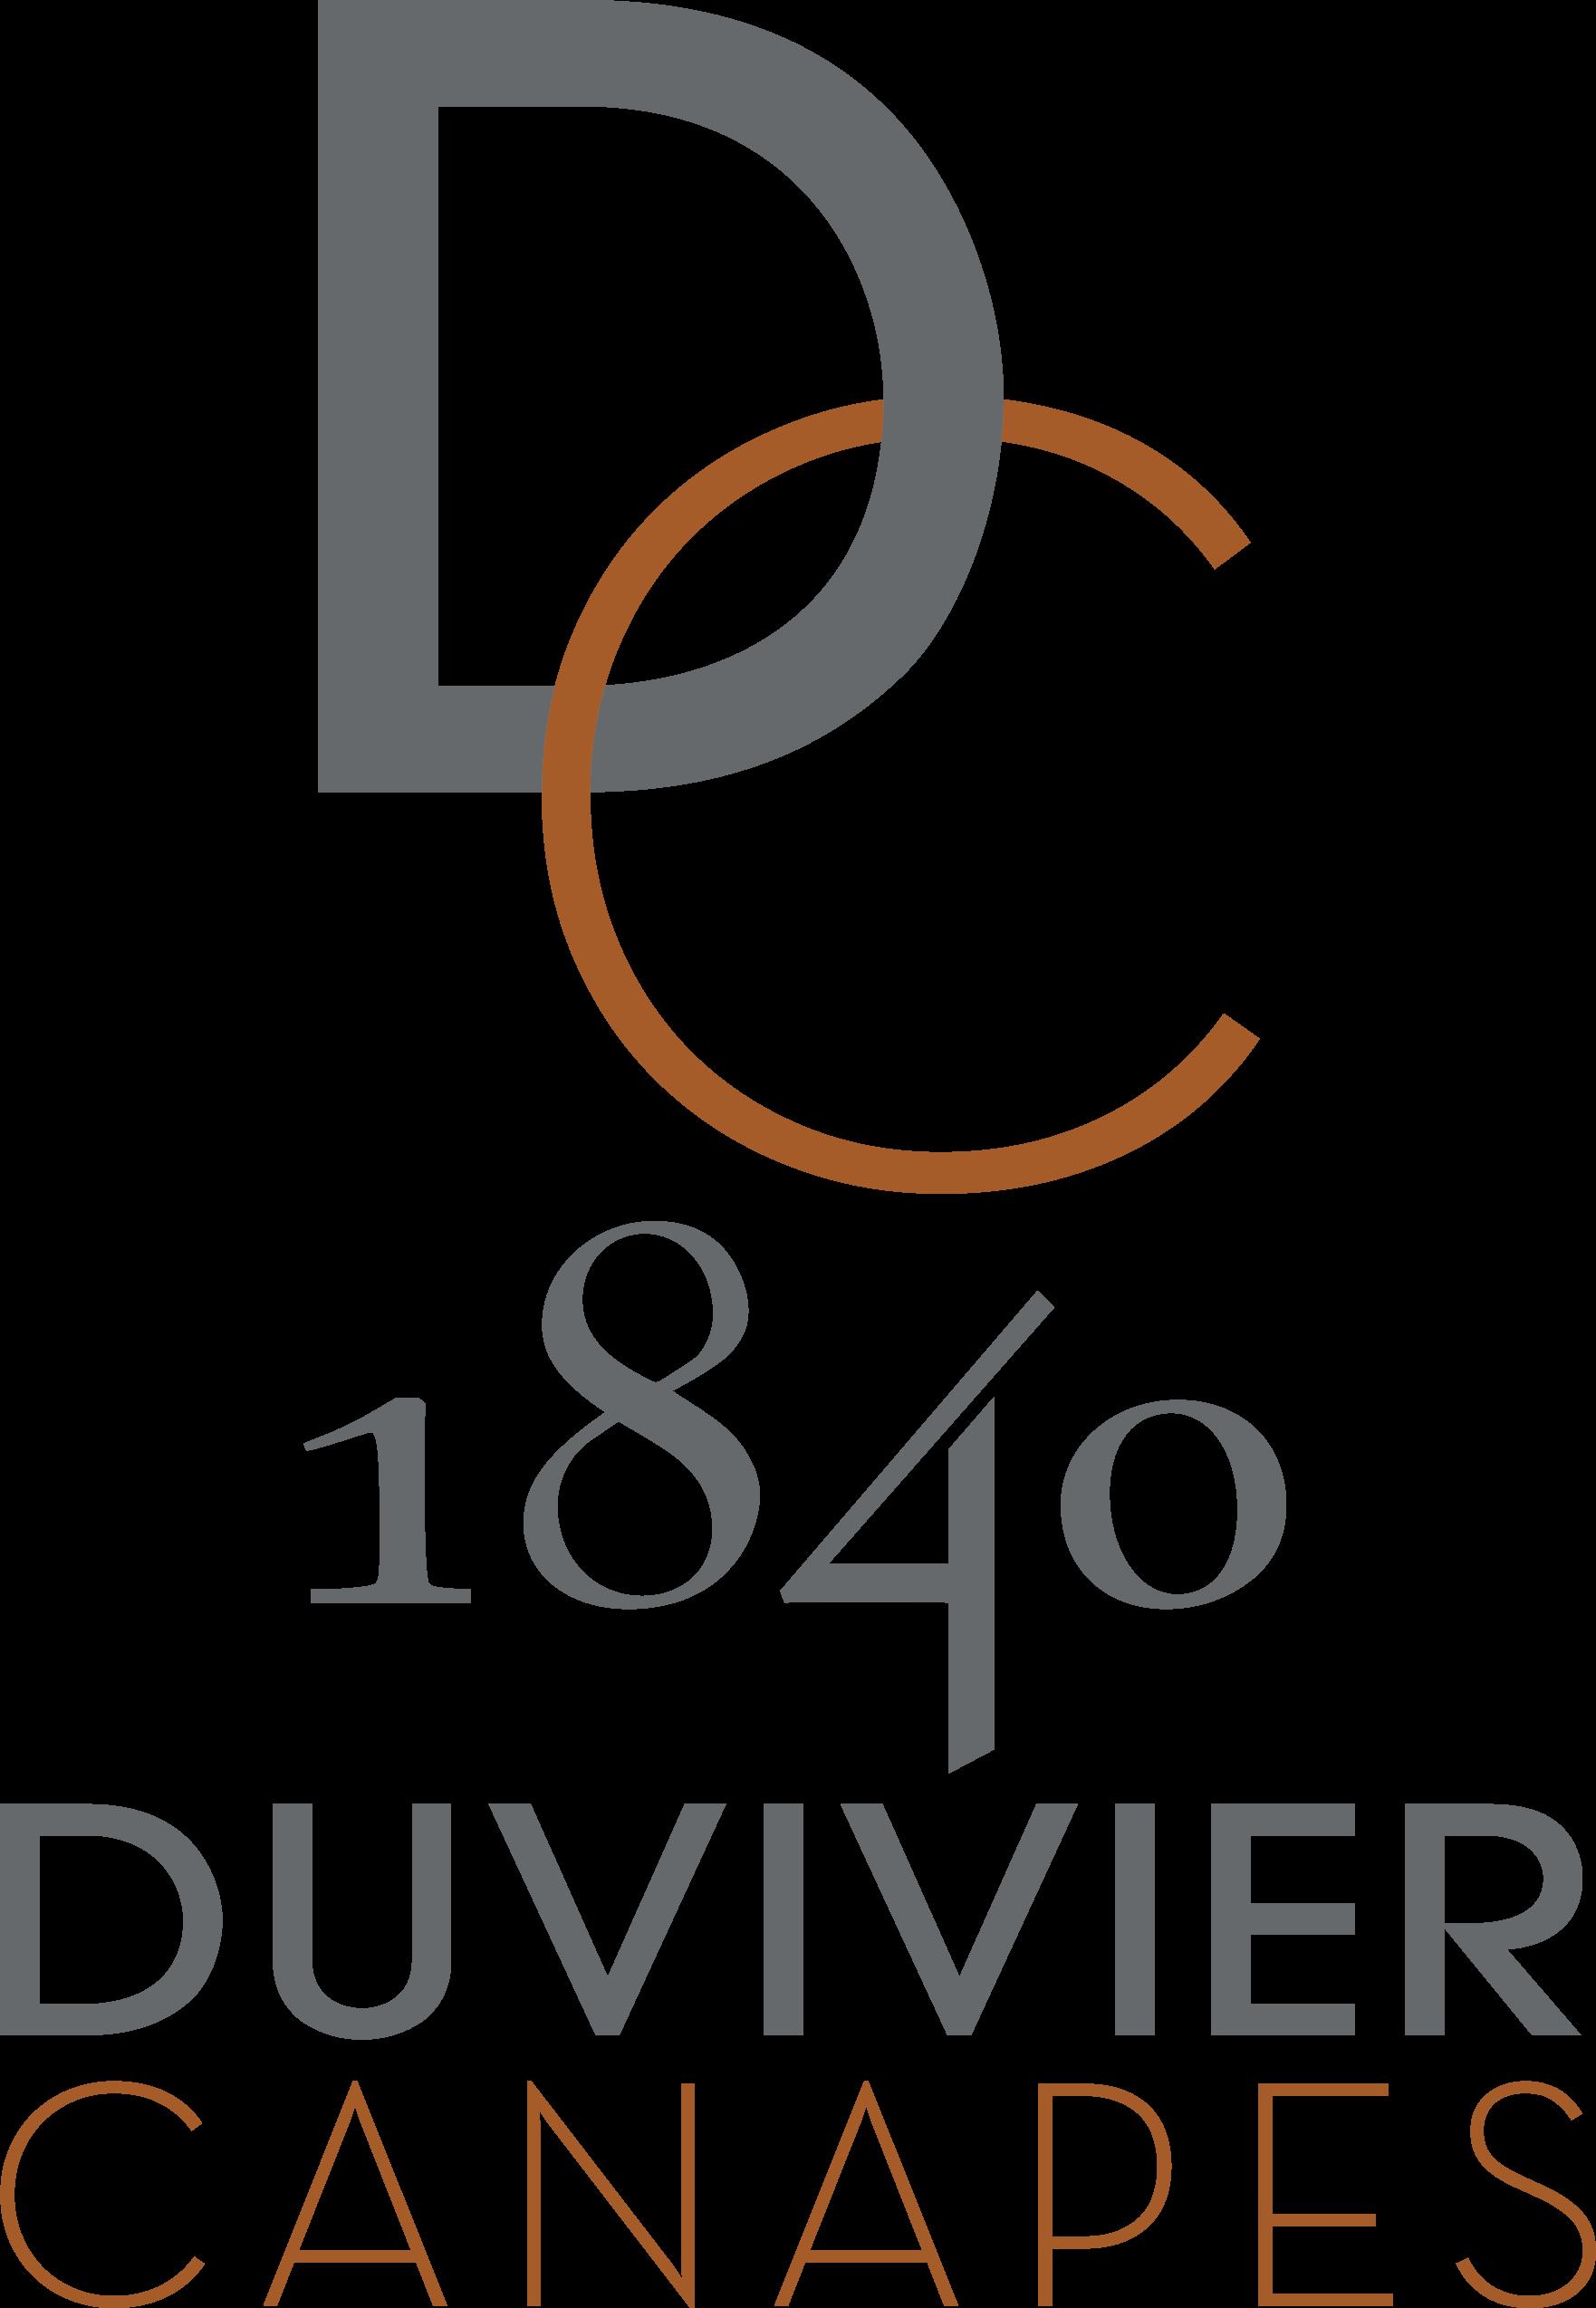 Duvivier Canapés 1840